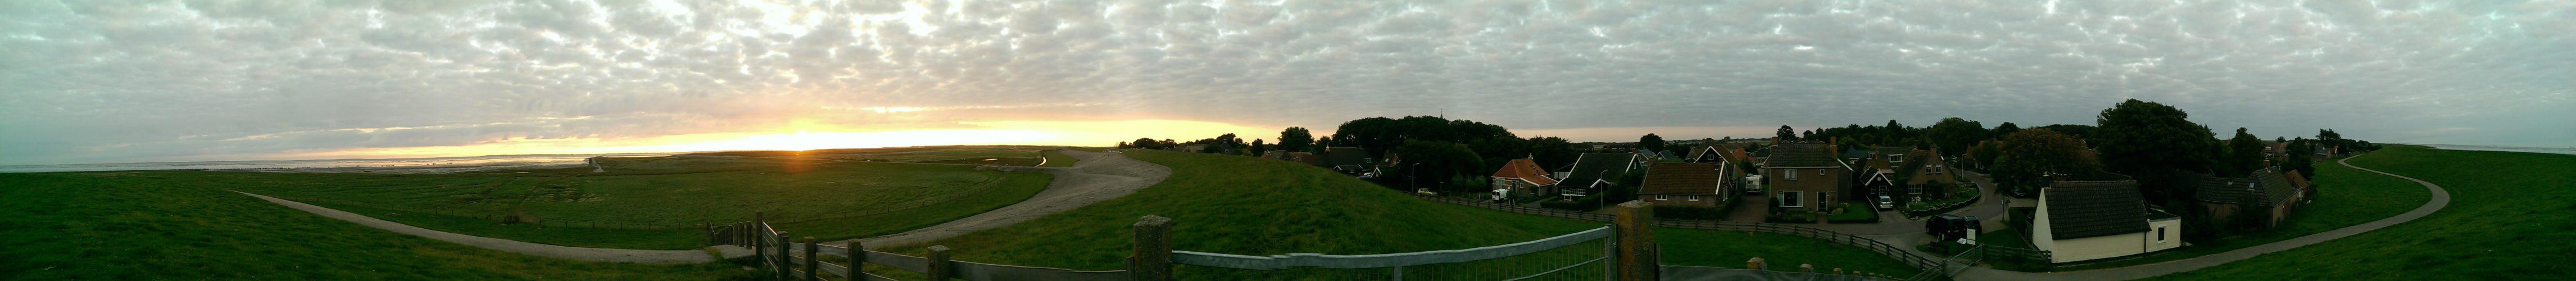 Moddergat Panorama